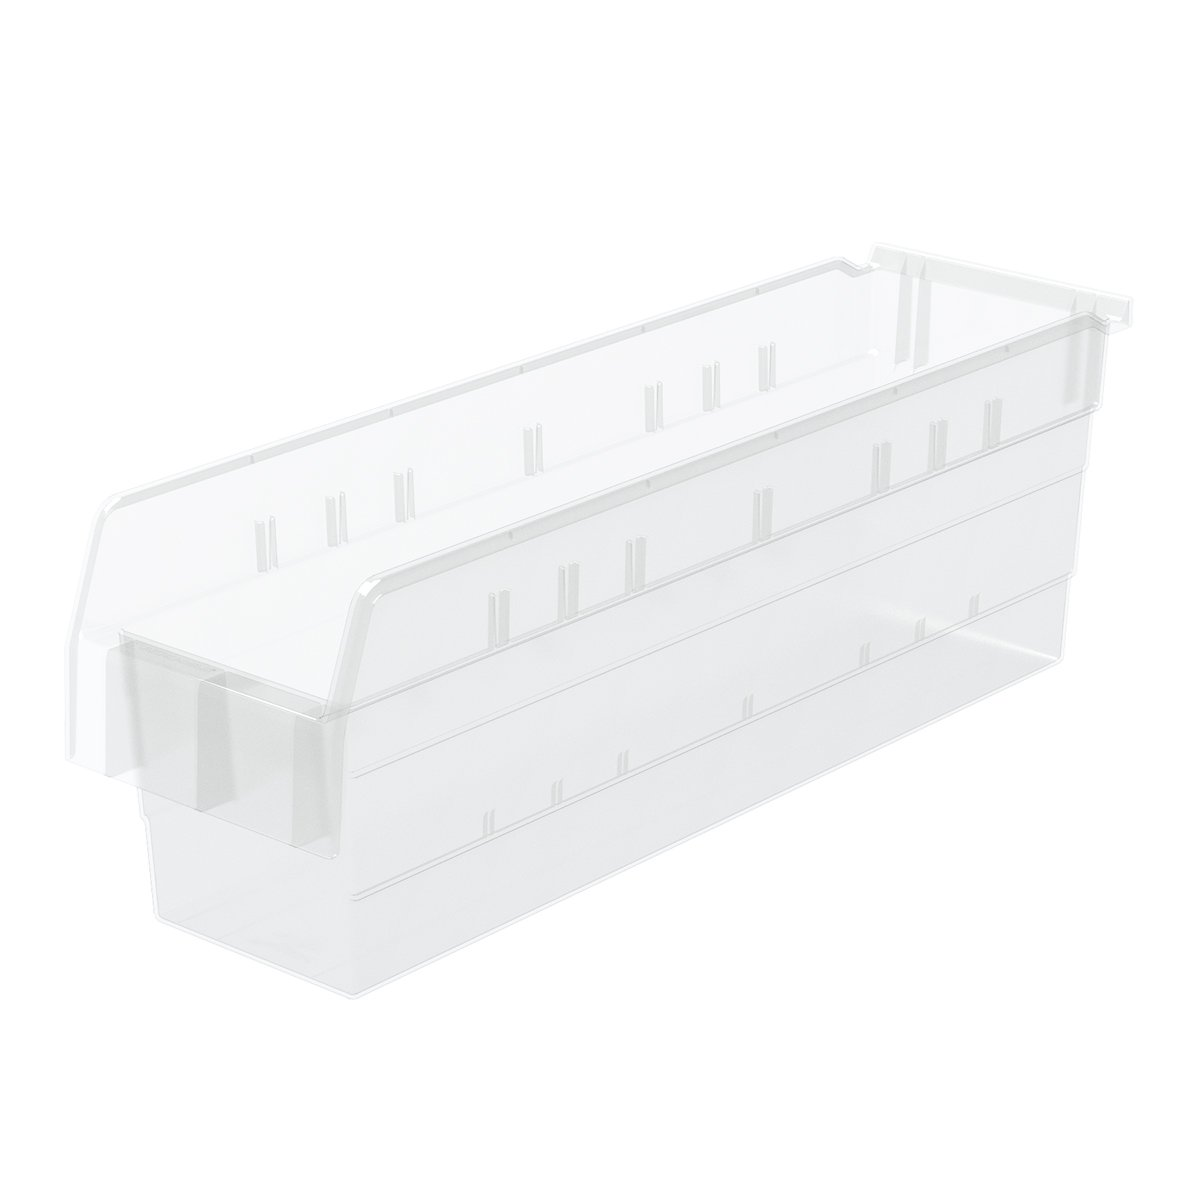 Akro-Mils 30864 ShelfMax 8 Plastic Nesting Shelf Bin Box, 24-Inch x 6-Inch x 8-Inch, Clear, 10-Pack